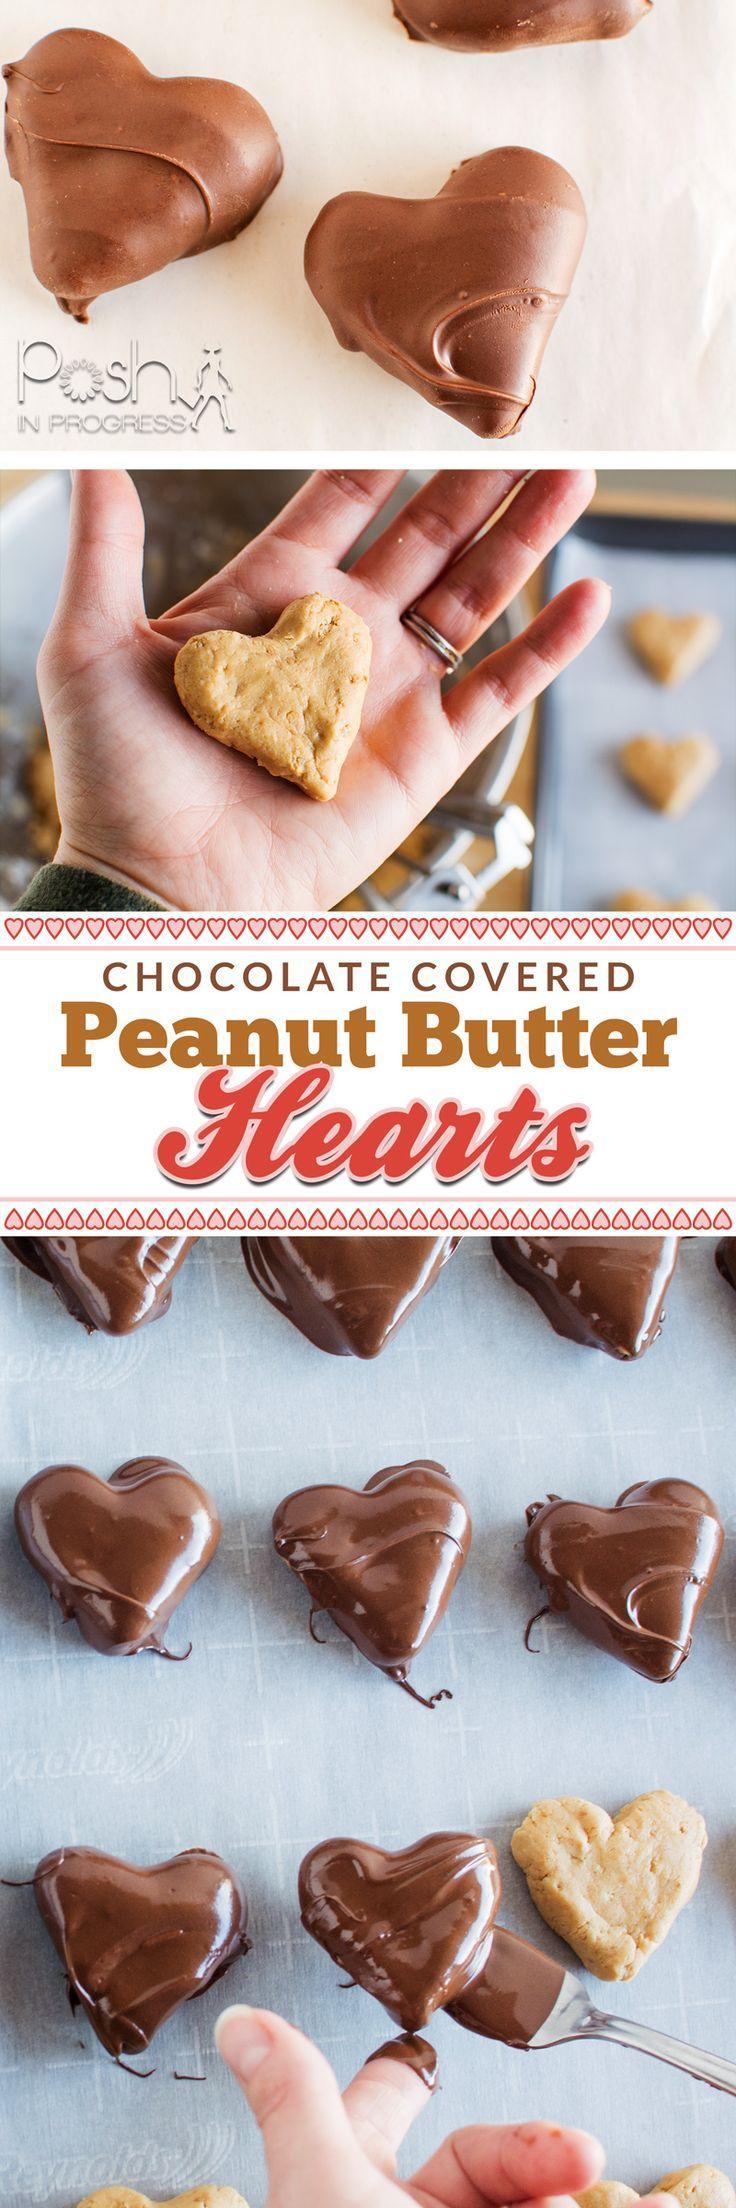 Chocolate Covered Peanut Butter Hearts Posh In Progress Chocolate Covered Peanuts Chocolate Covered Peanut Butter Balls Recipe